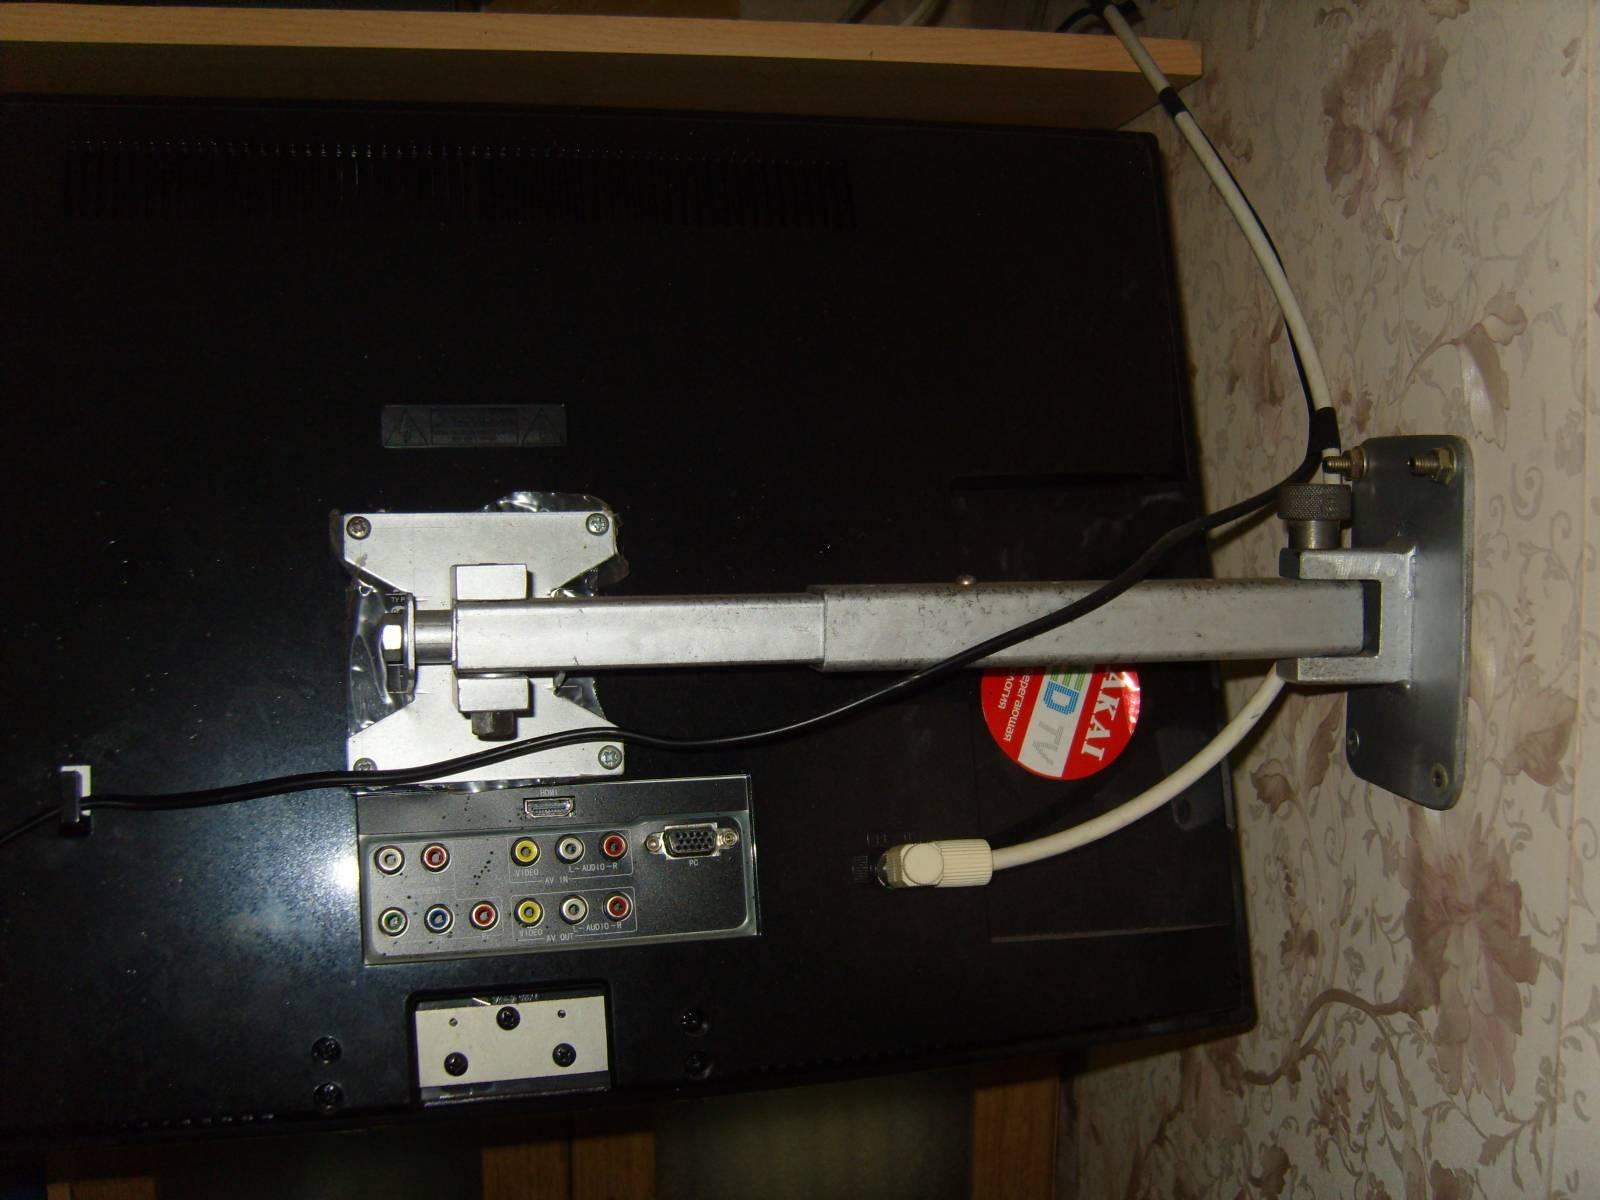 Кронштейн для телевизора 43 дюйма своими руками